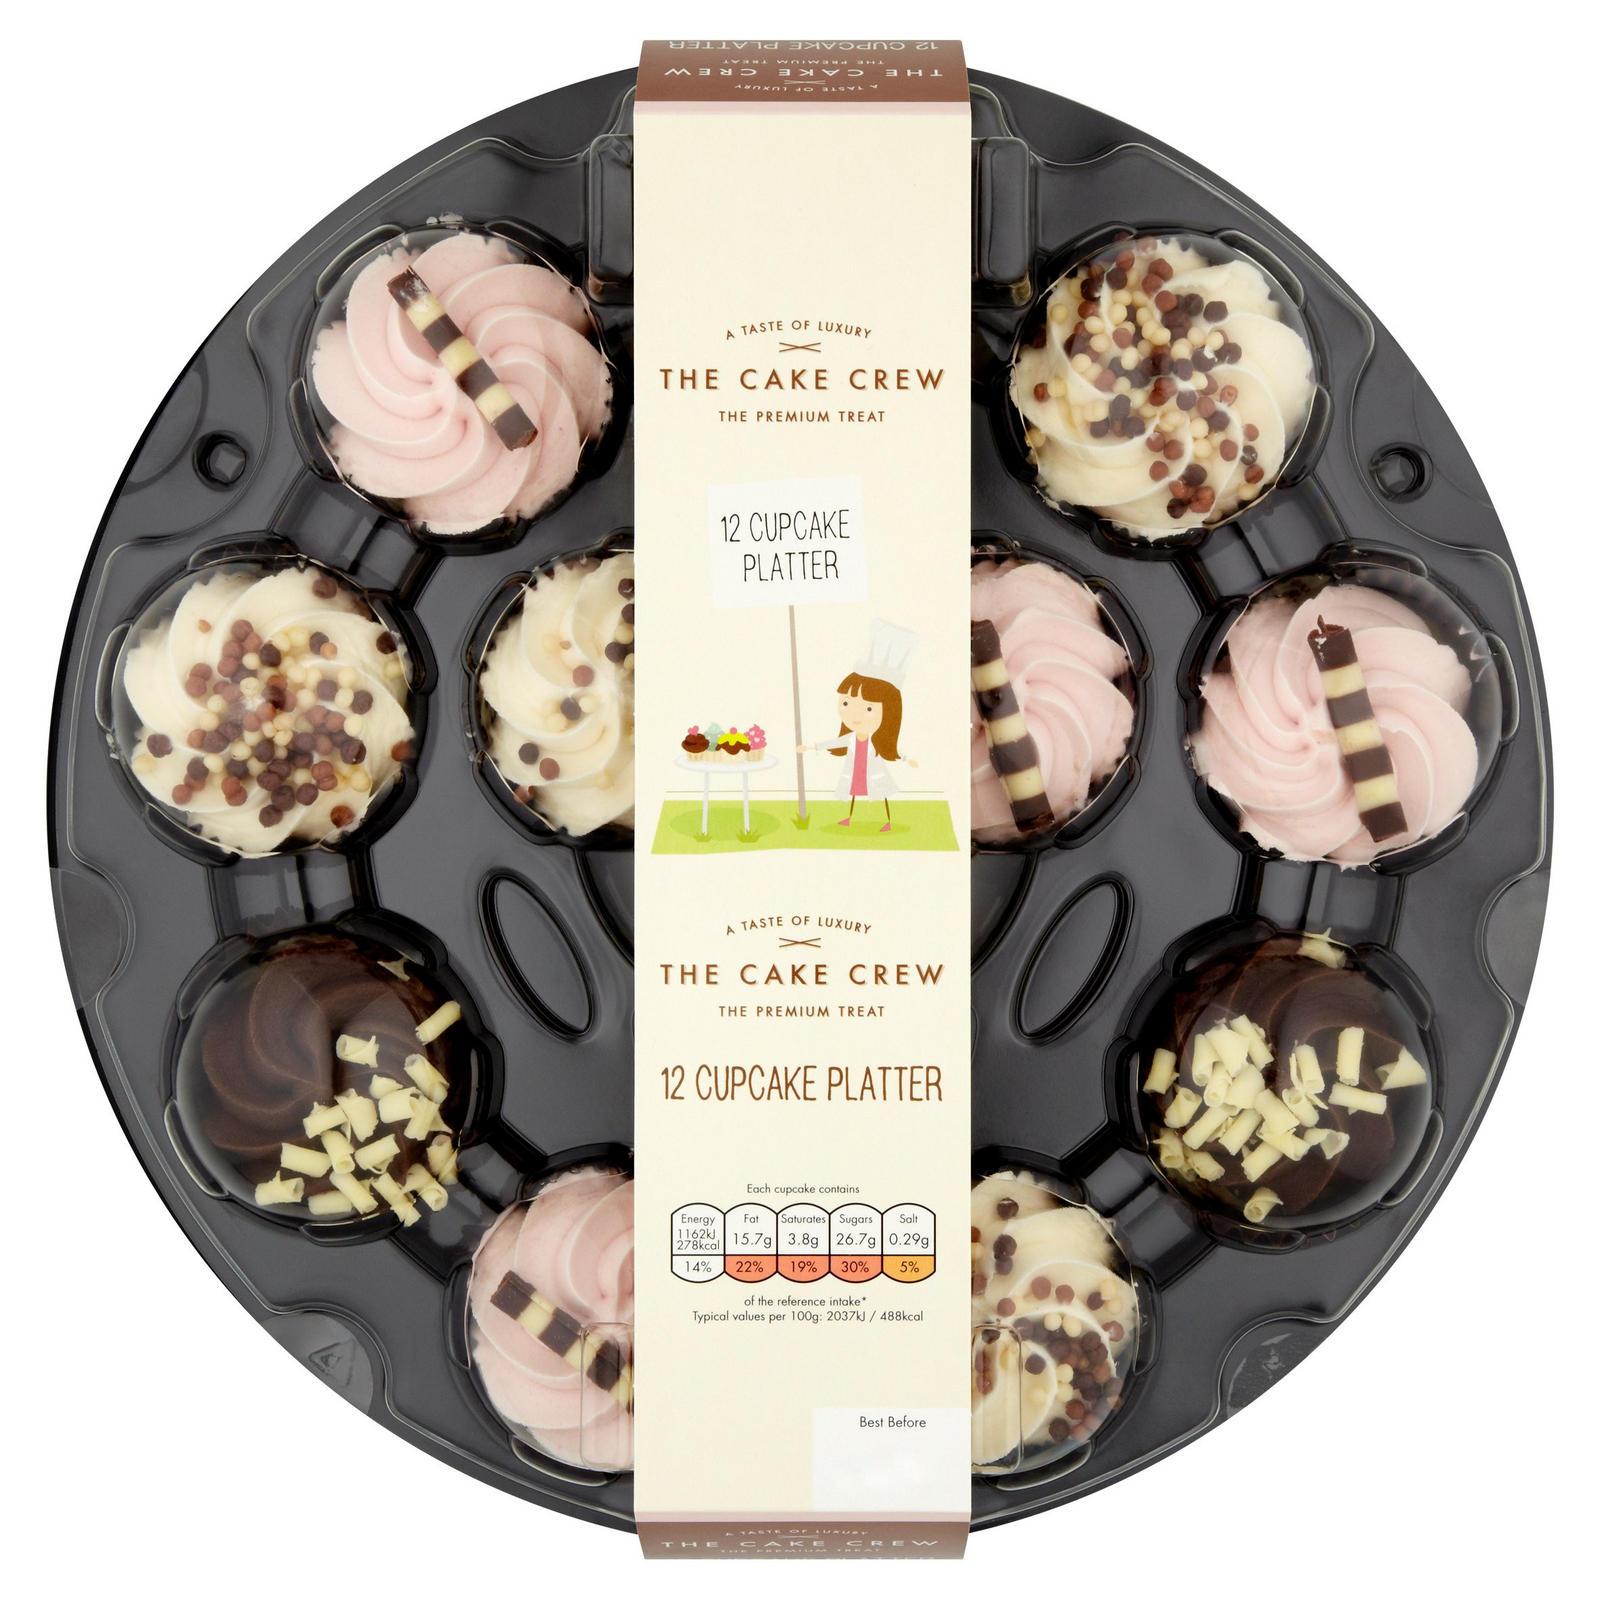 The Cake Crew 12 Cupcake Platter Iceland Foods